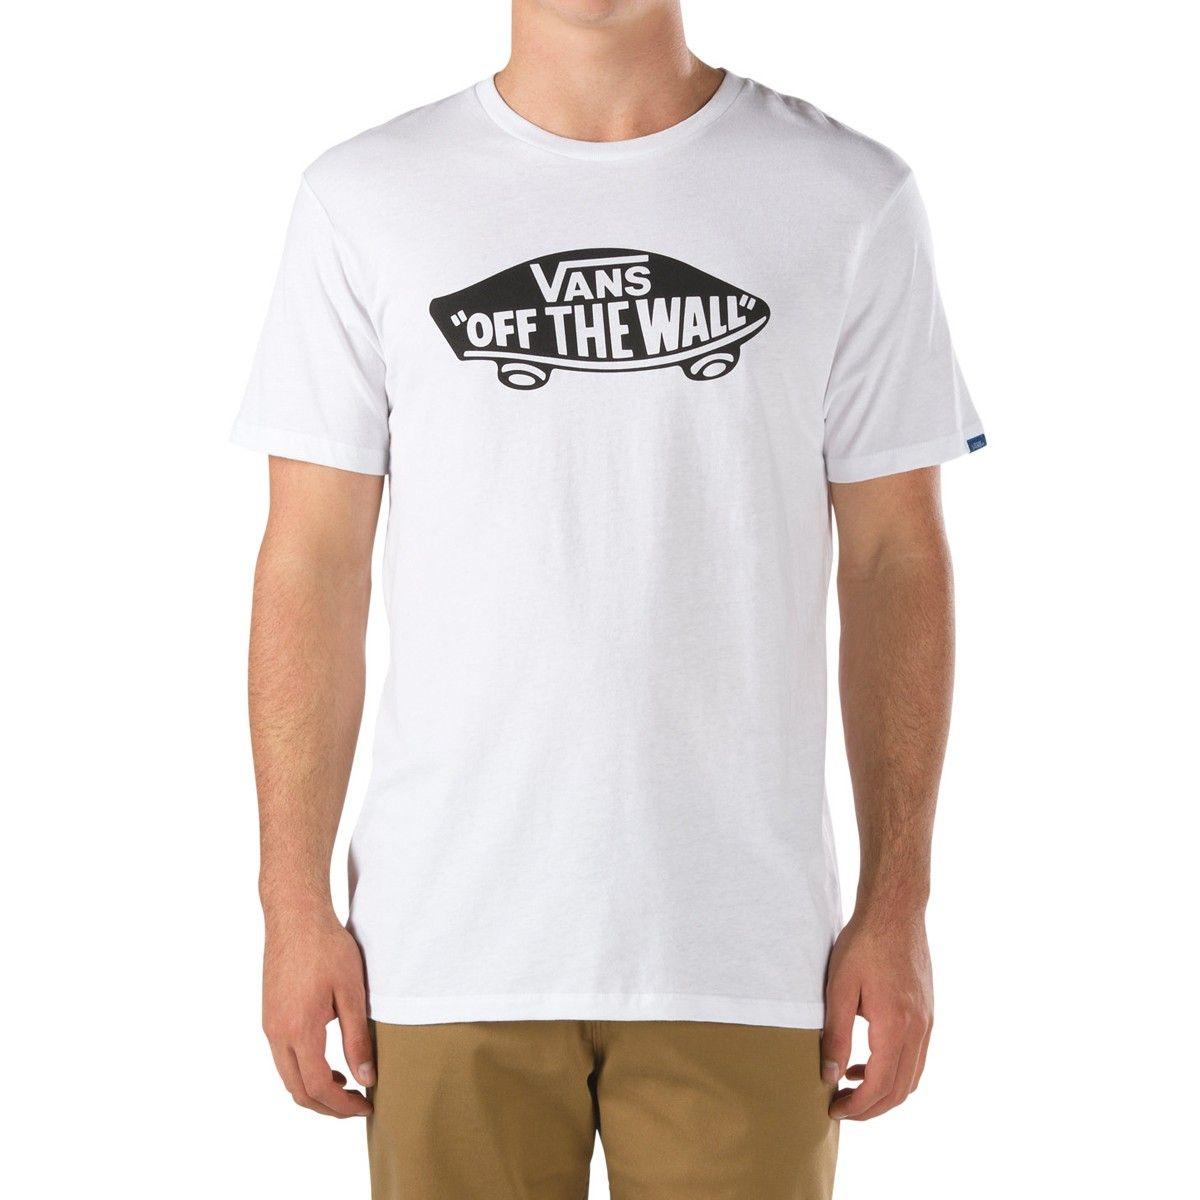 t-shirt vans off the wall